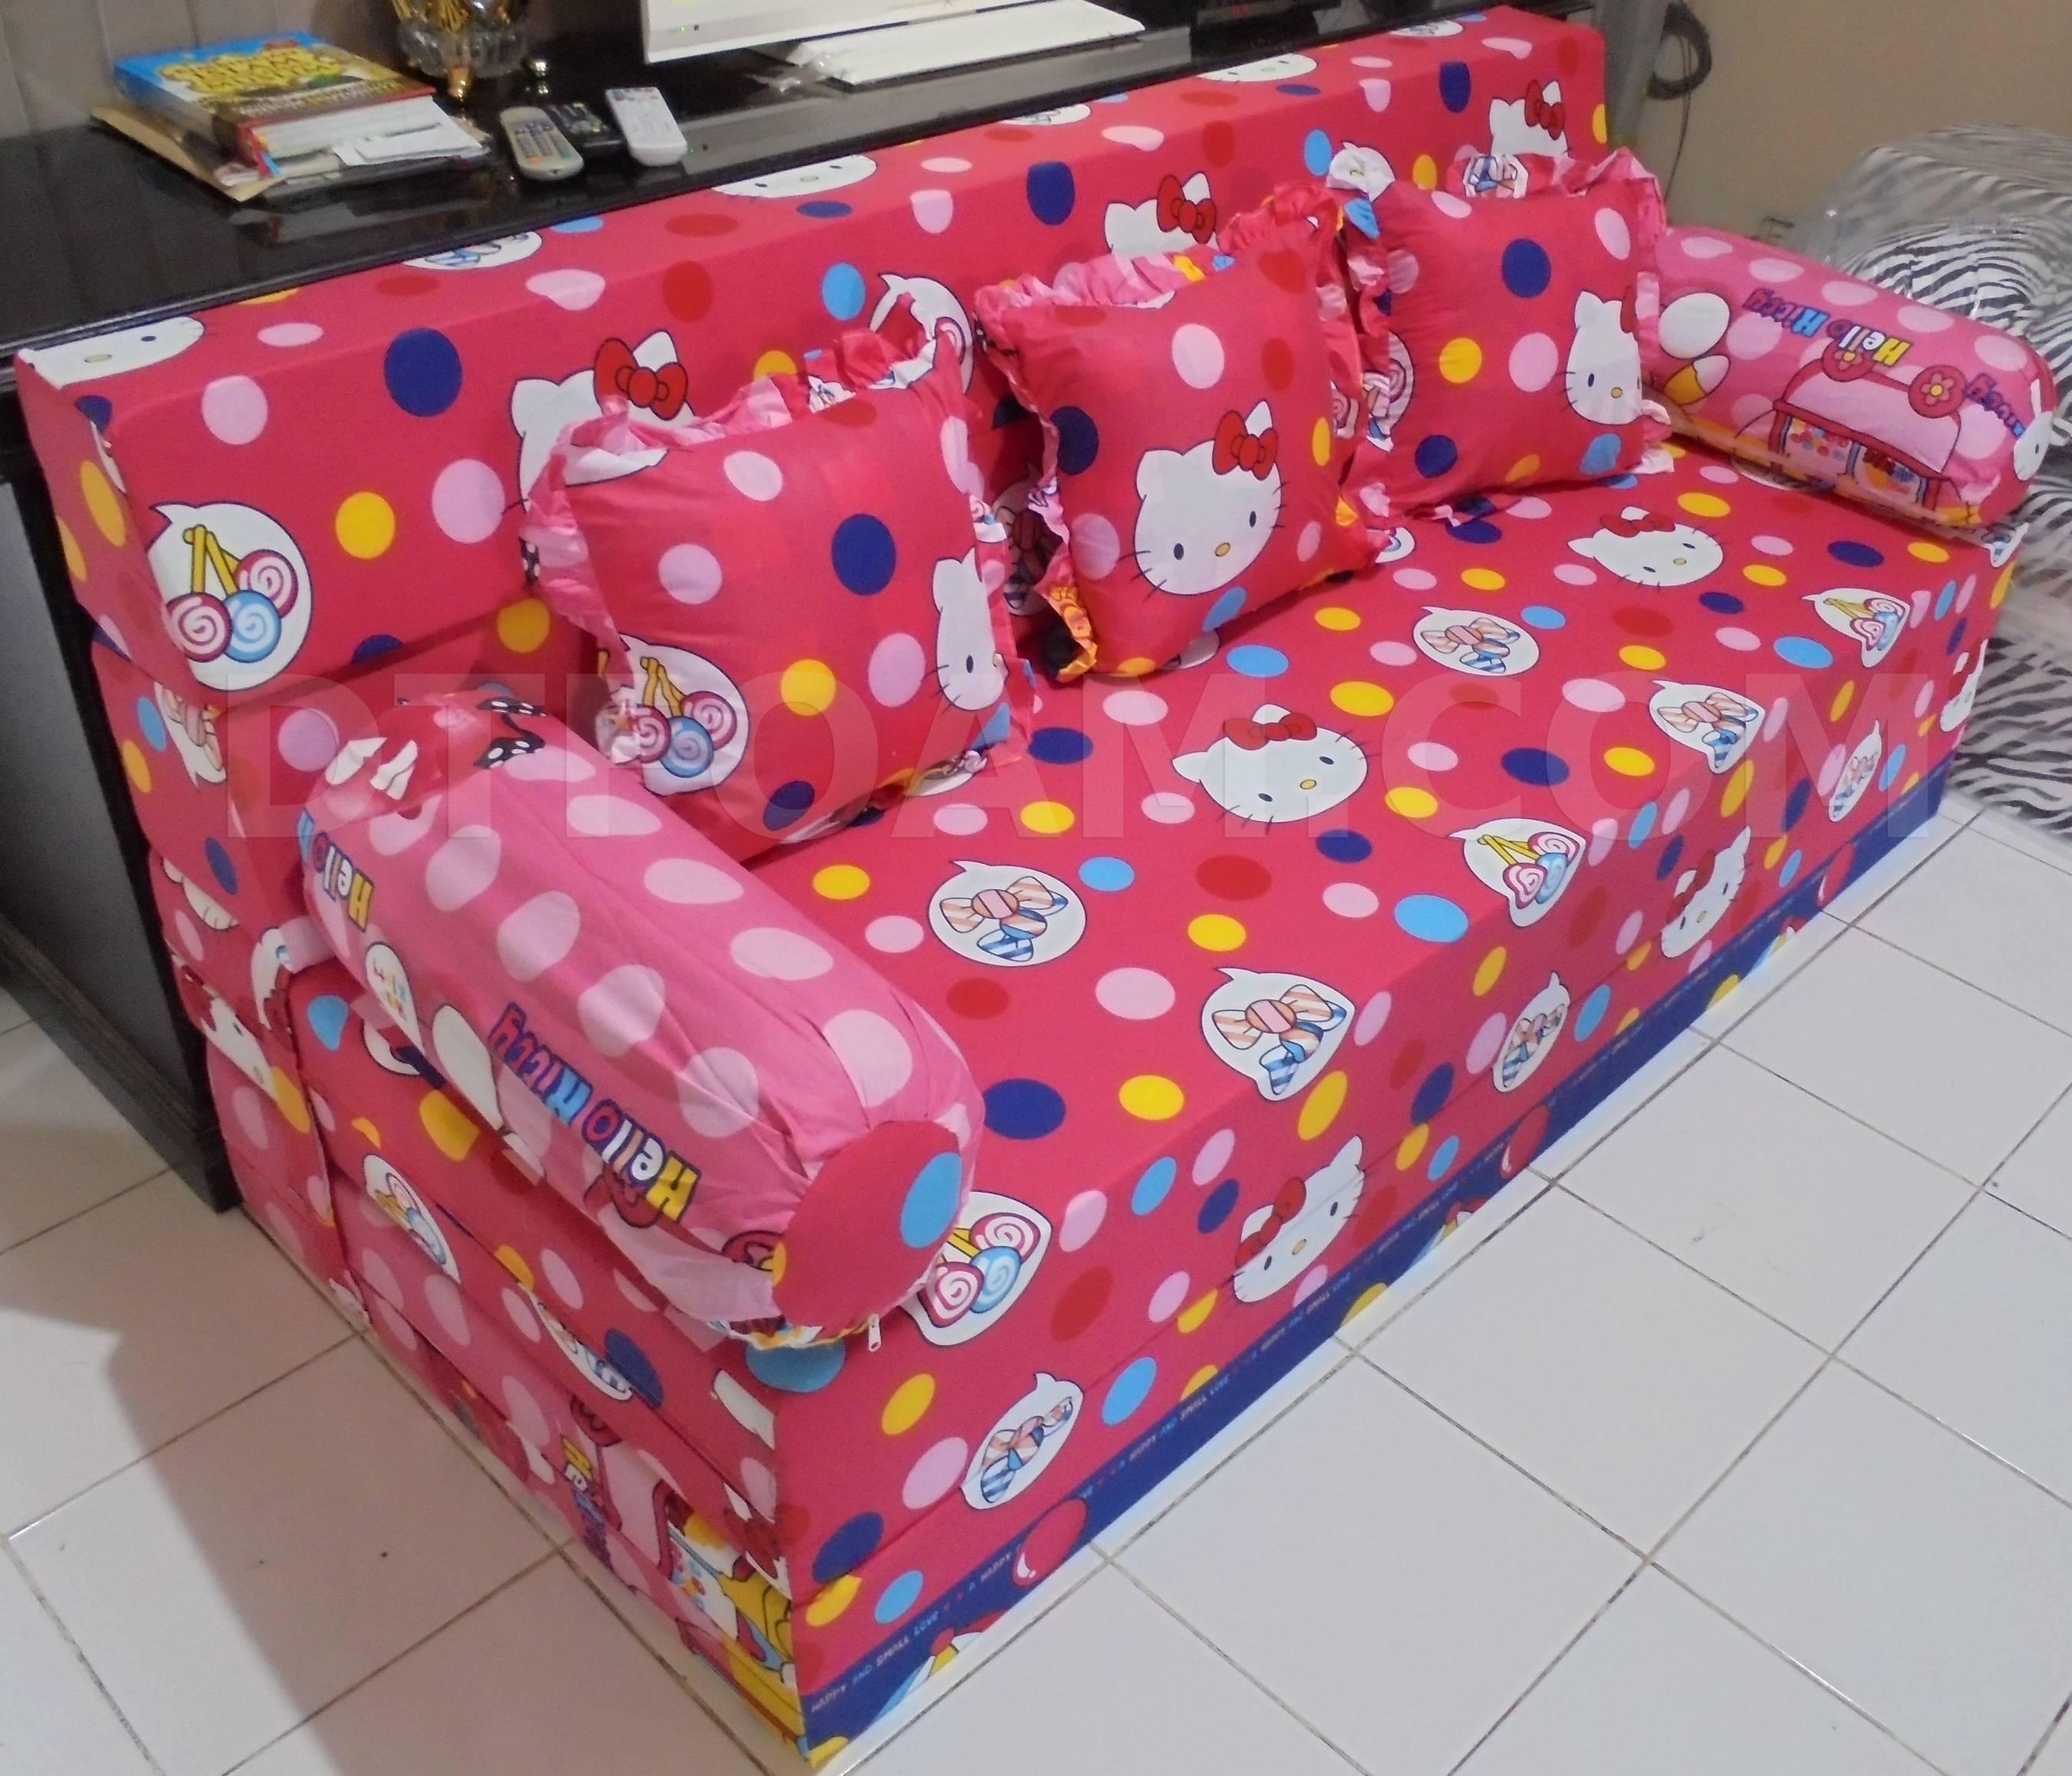 sofa bed kasur busa lipat inoac jakarta cheap outdoor sectional 74 chandra karya pramuka sobhome